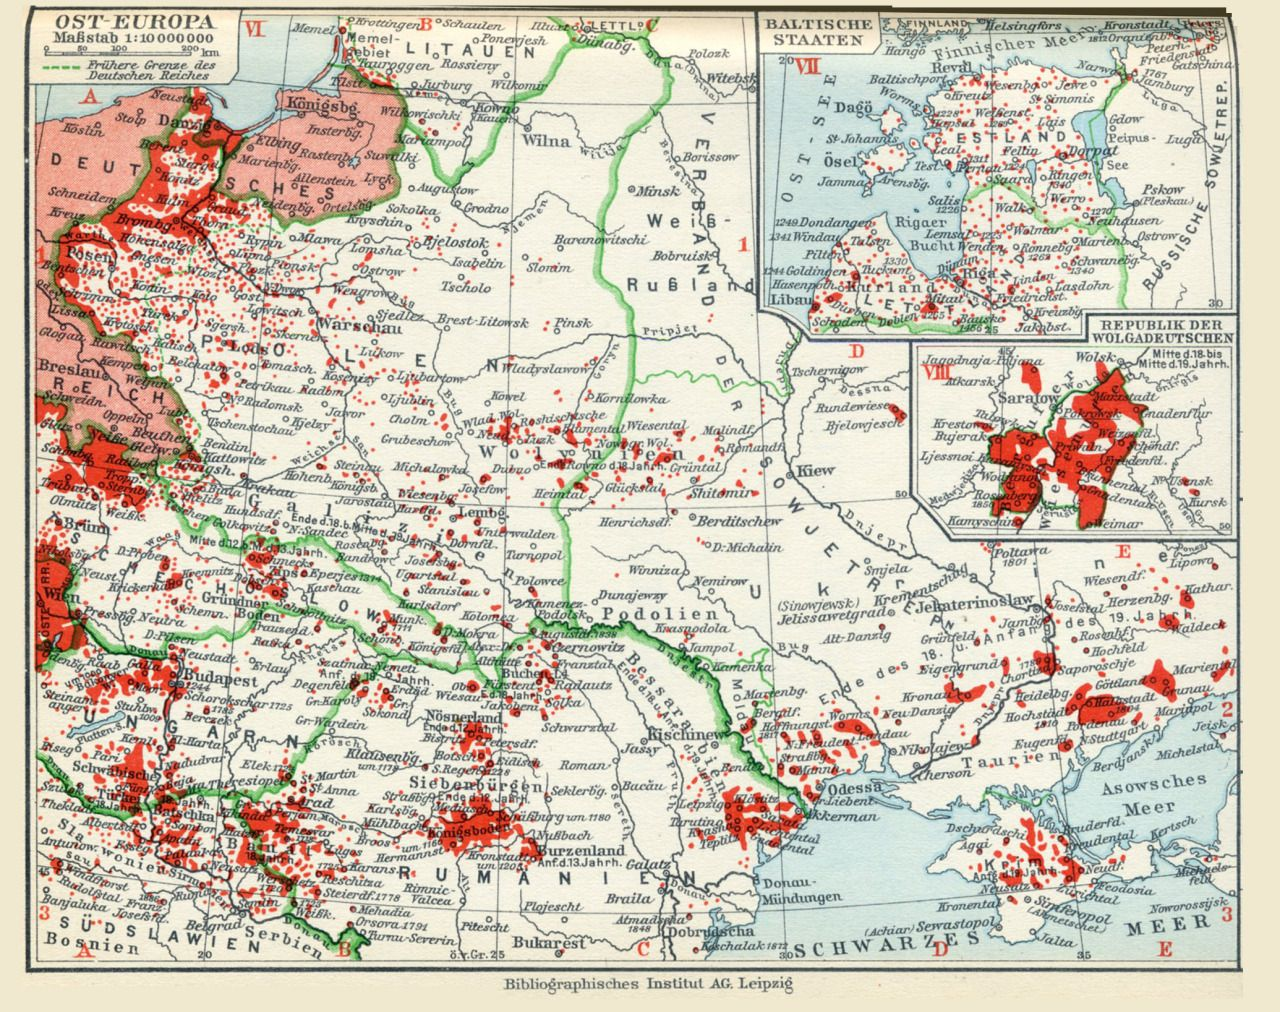 map of eastern europe 1930 mapsontheweb | Map, Europe map, Historical maps